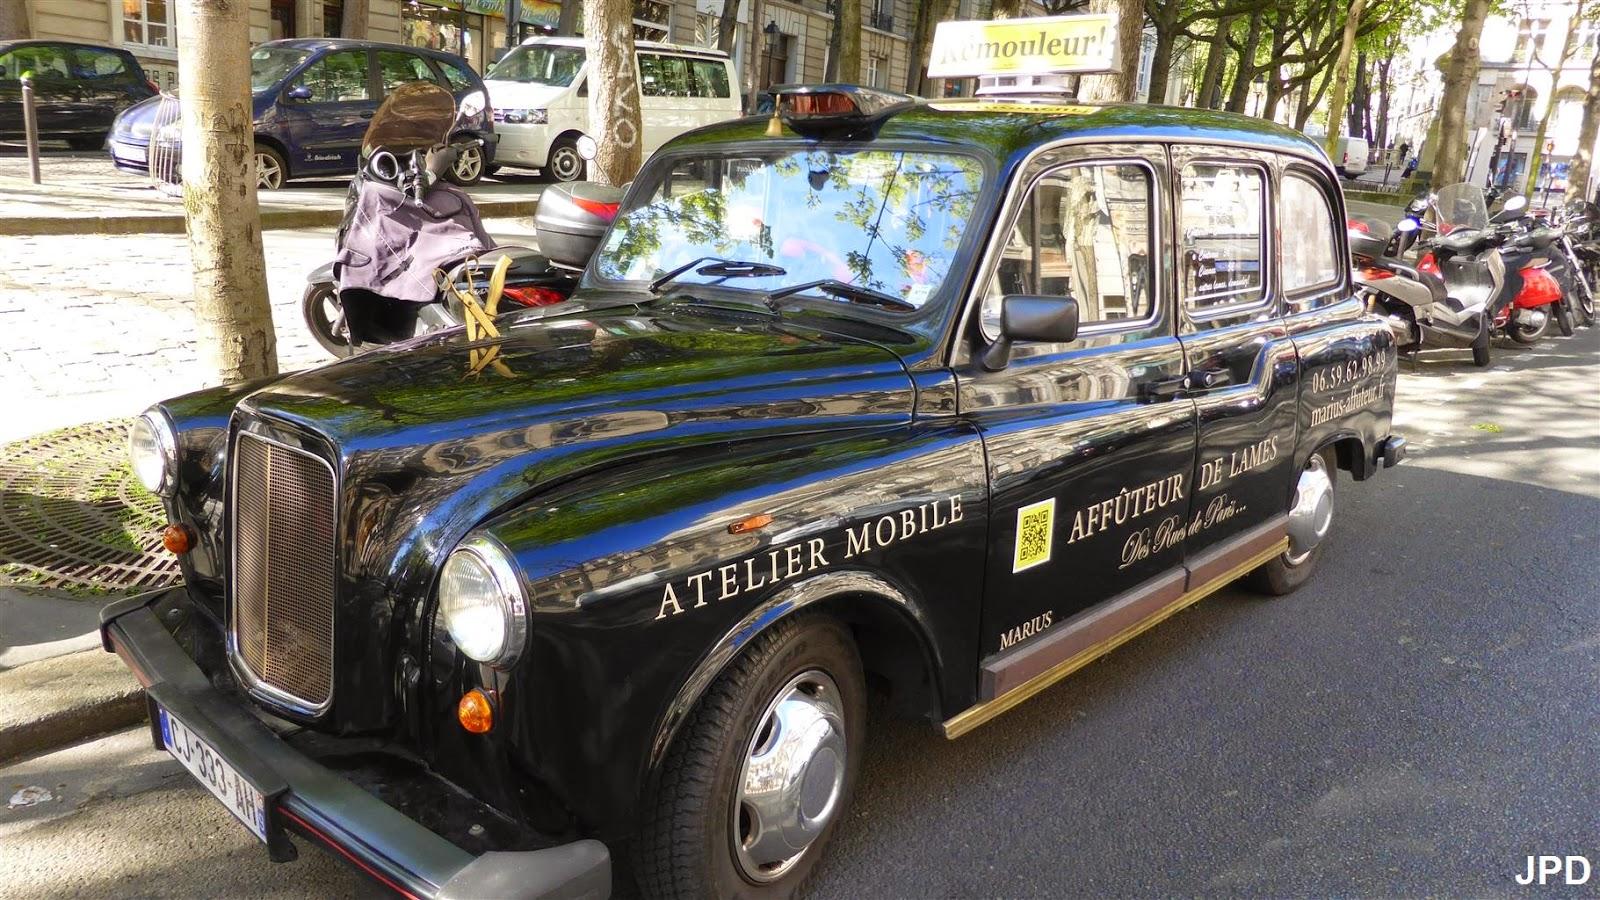 taxi maison laffitte taxivtc affili with taxi maison laffitte best reserver taxi aroport de. Black Bedroom Furniture Sets. Home Design Ideas